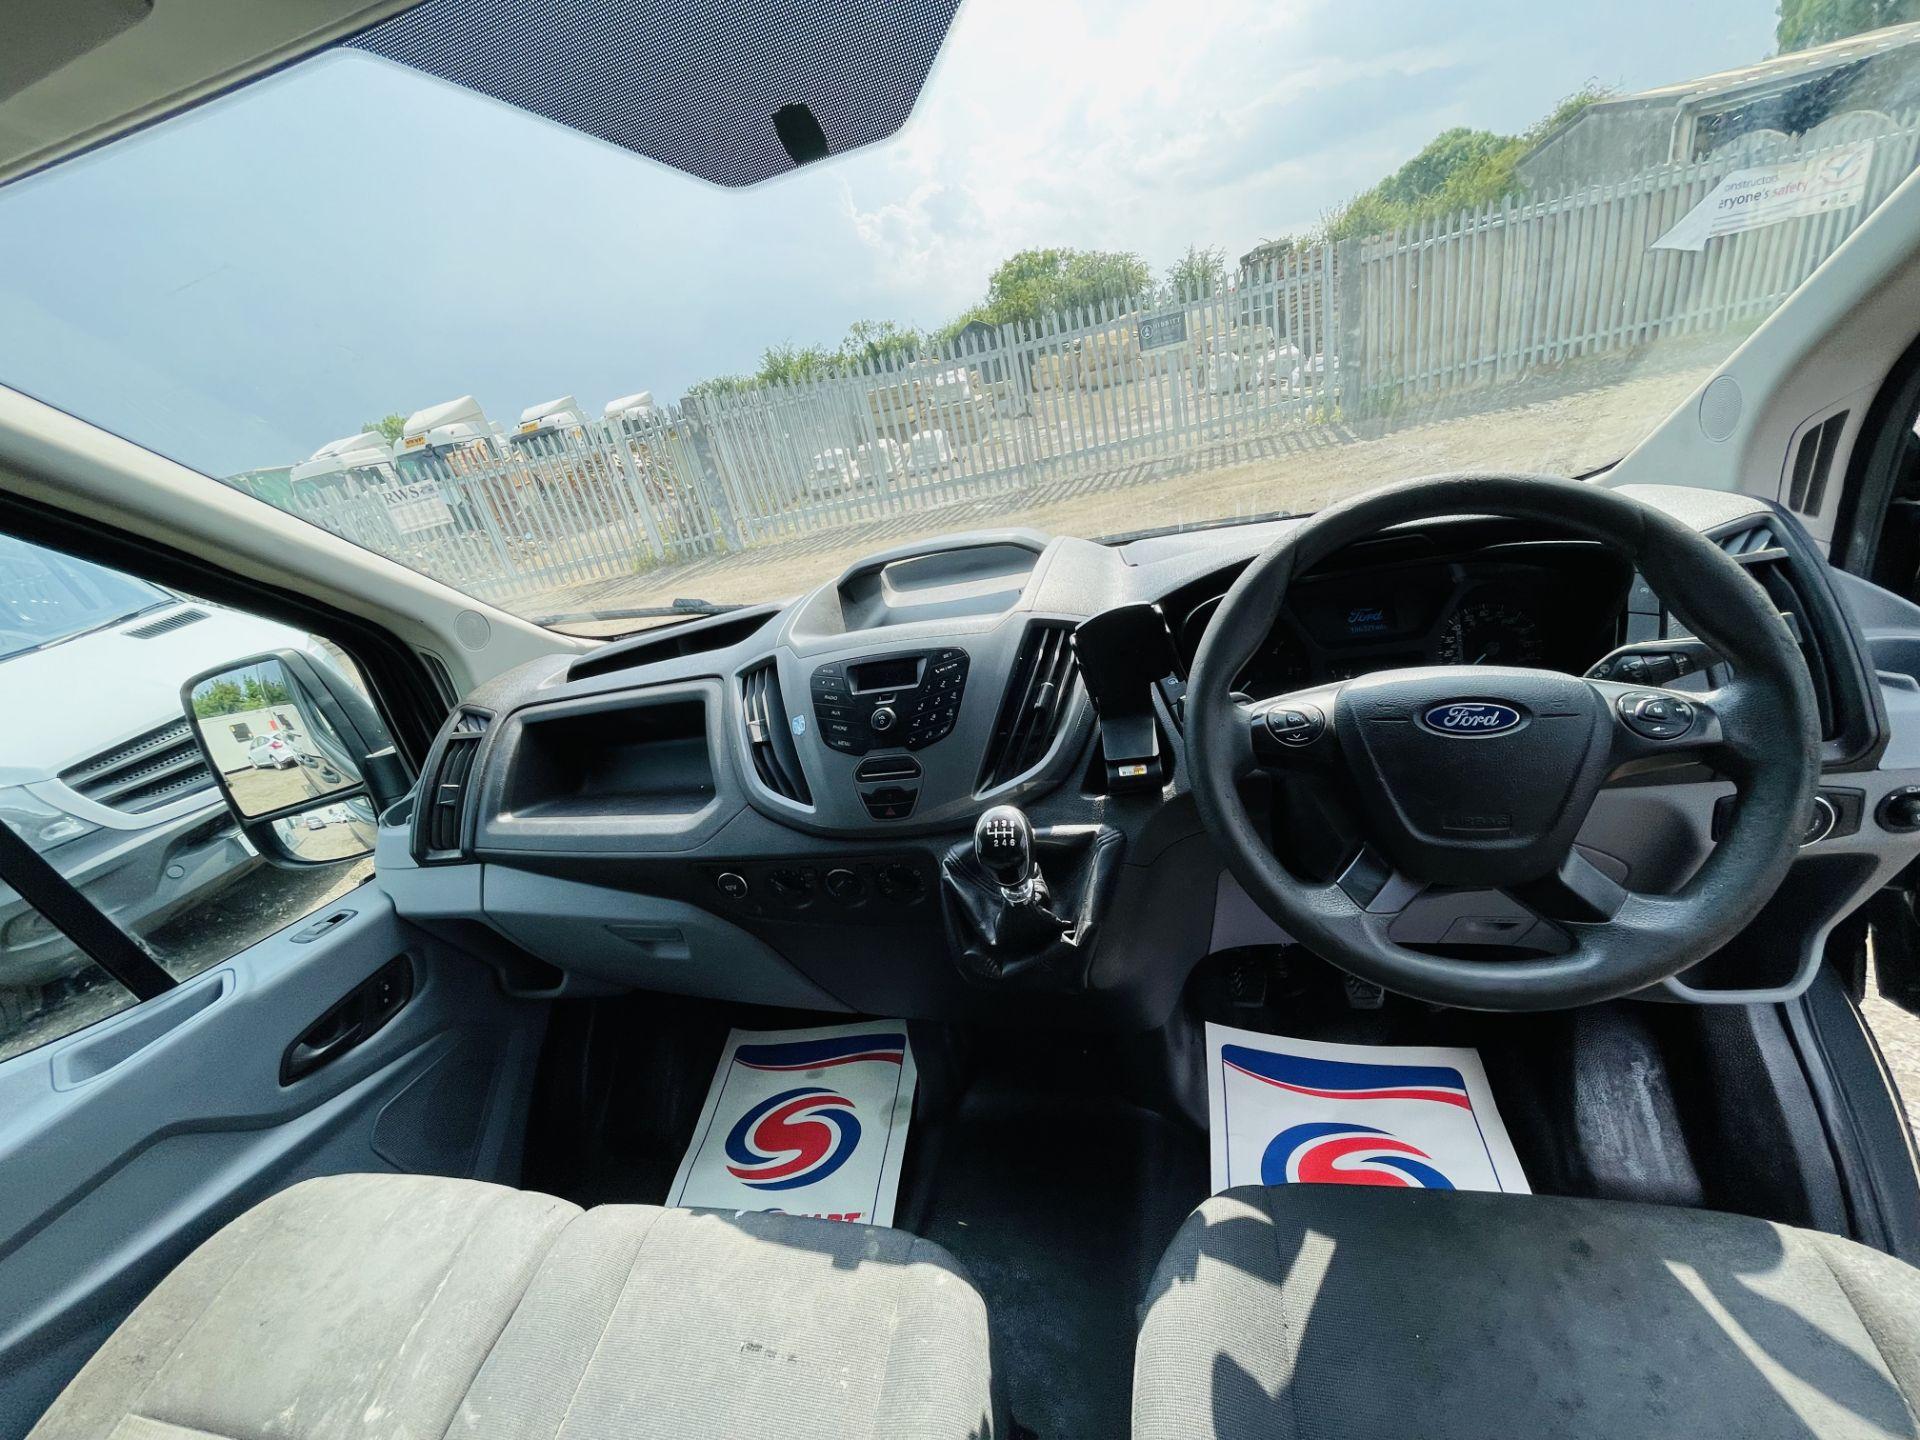 Ford Transit 2.2 TDCI 100 L3 H2 T350 2015 '65 Reg' - Panel Van - LCV - Grey - Image 13 of 14